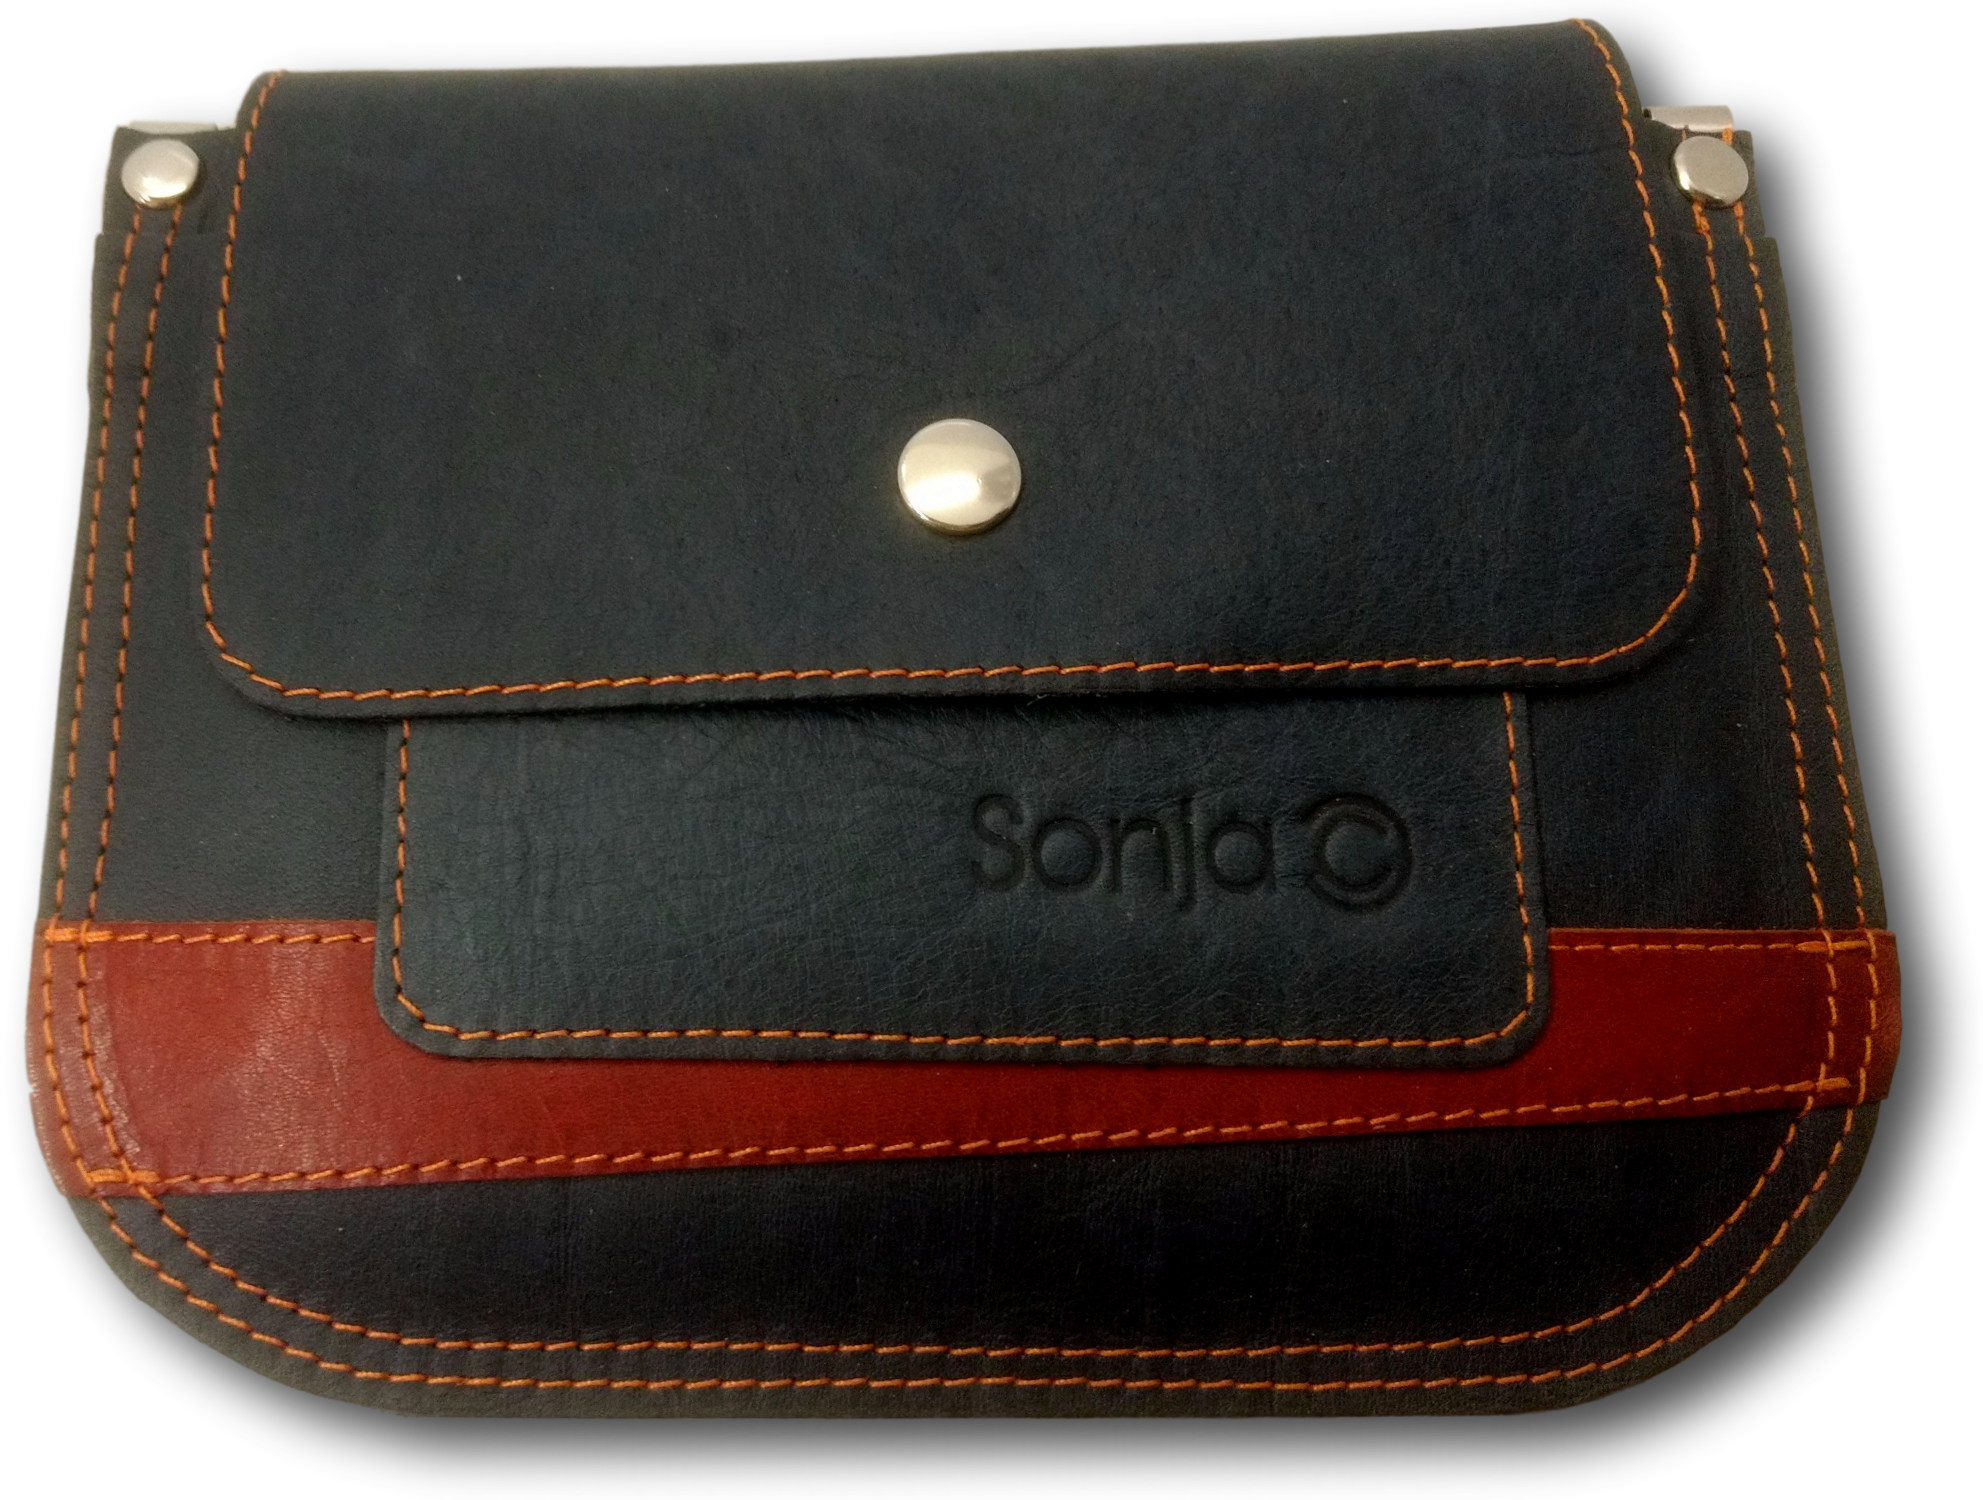 Charcoal & Tan Leather Pocket Bag